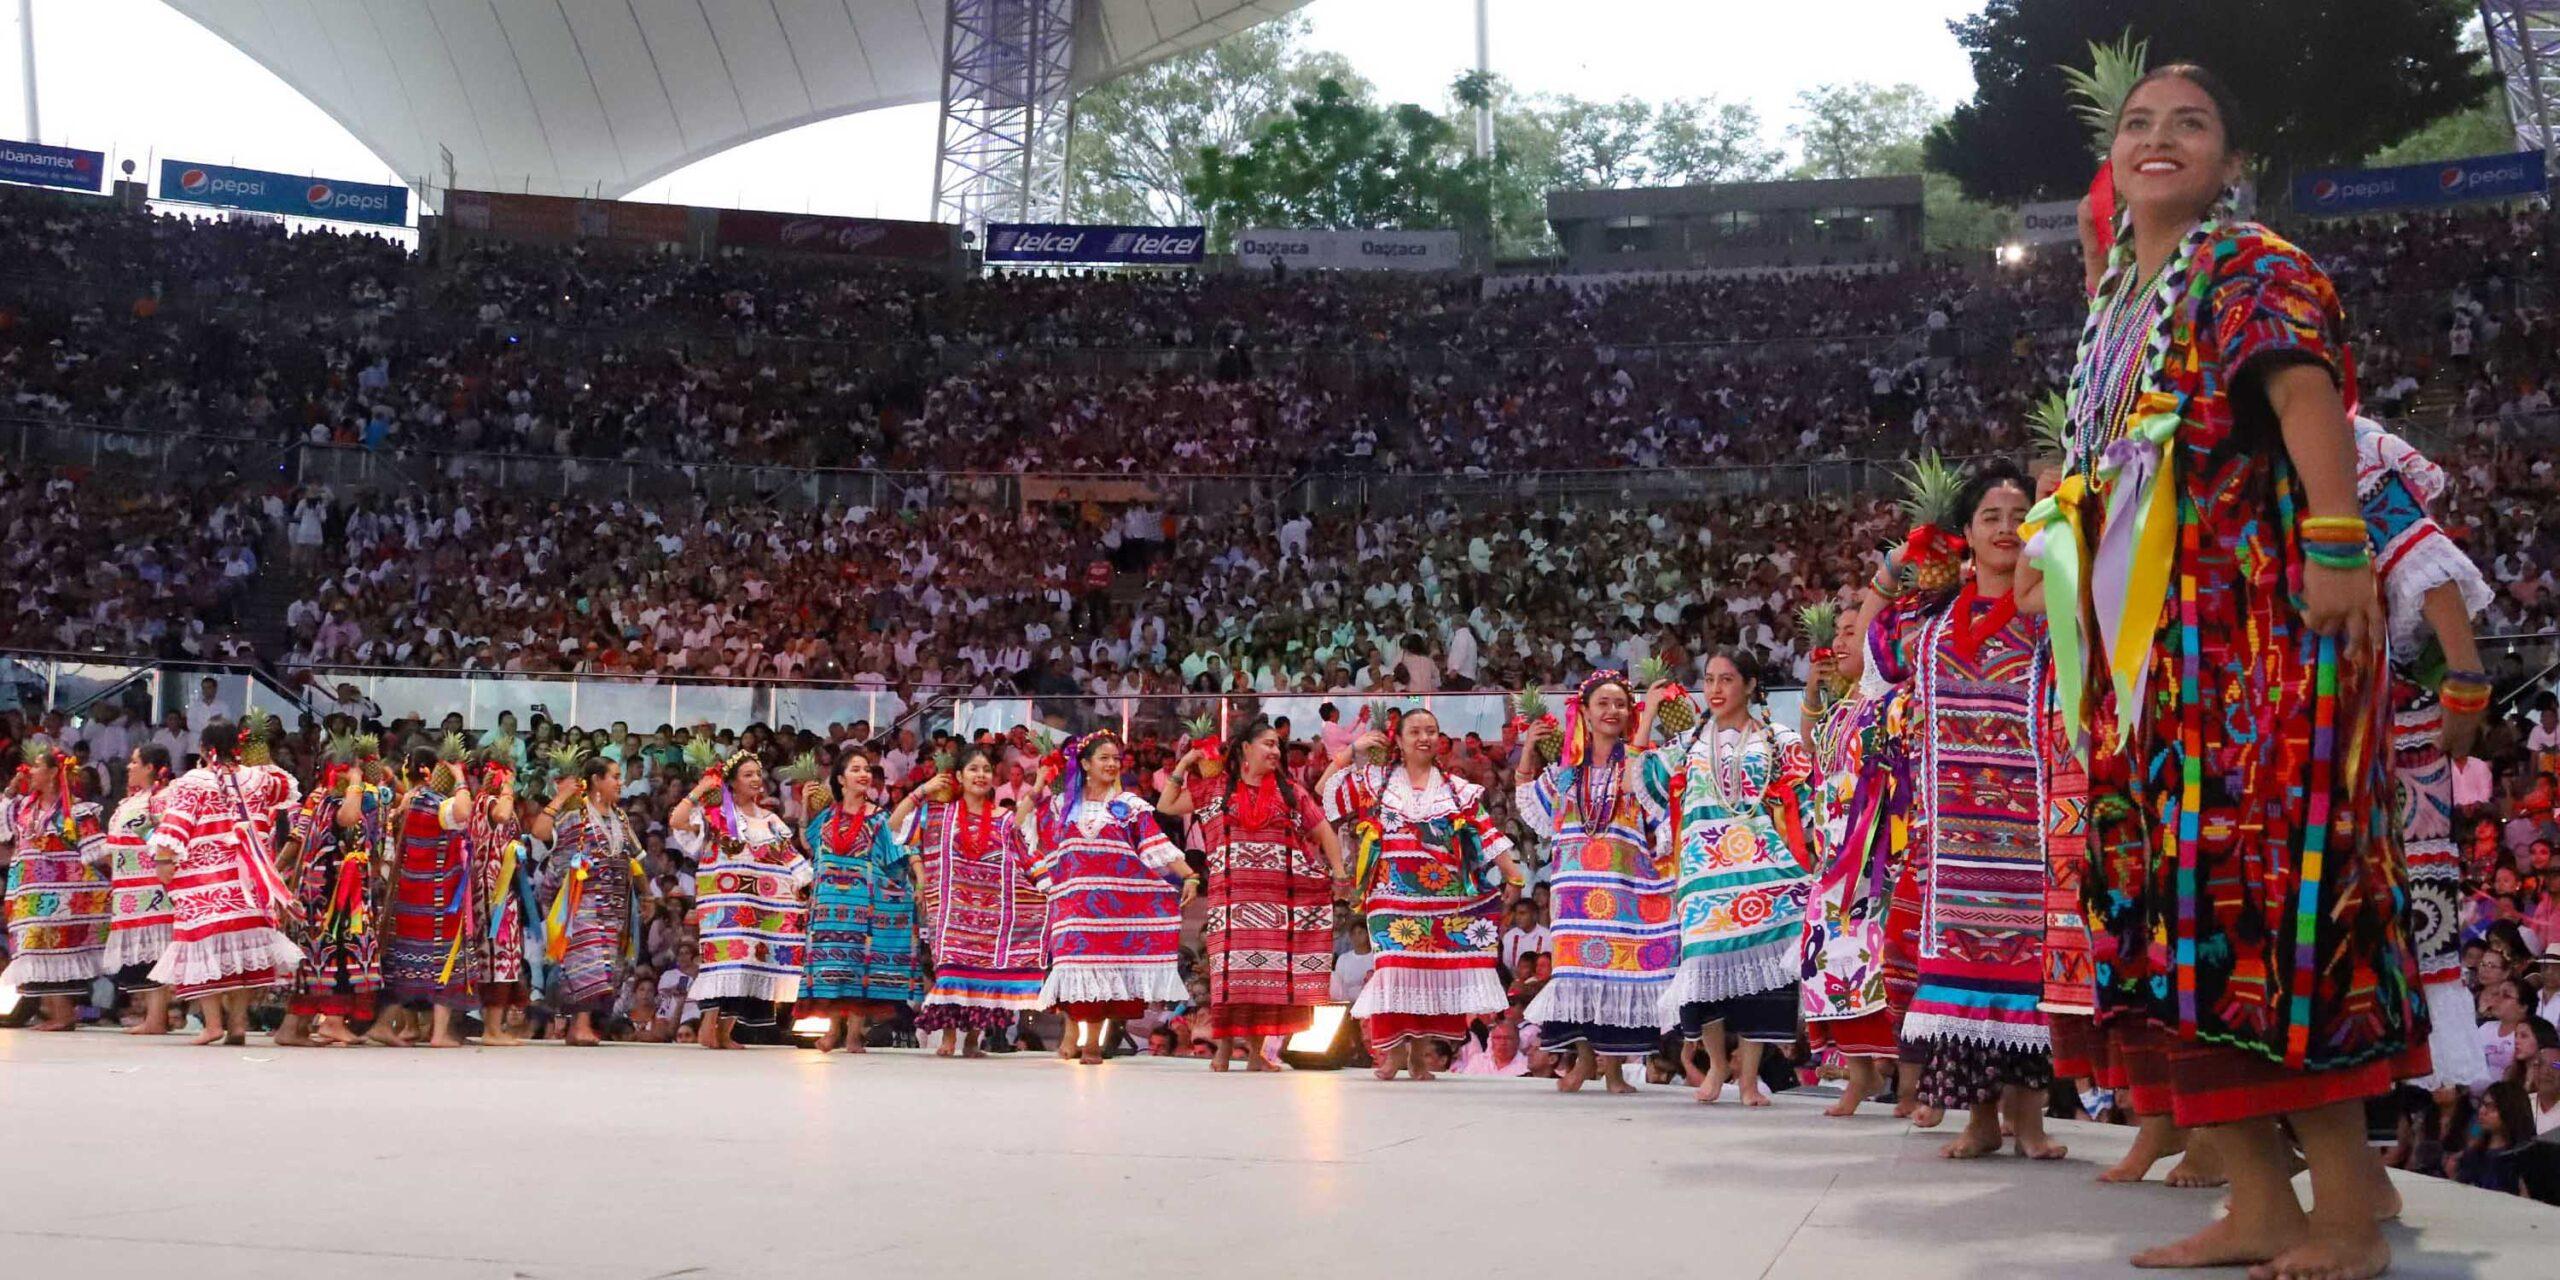 Abren una rendija para realizar la Guelaguetza   El Imparcial de Oaxaca